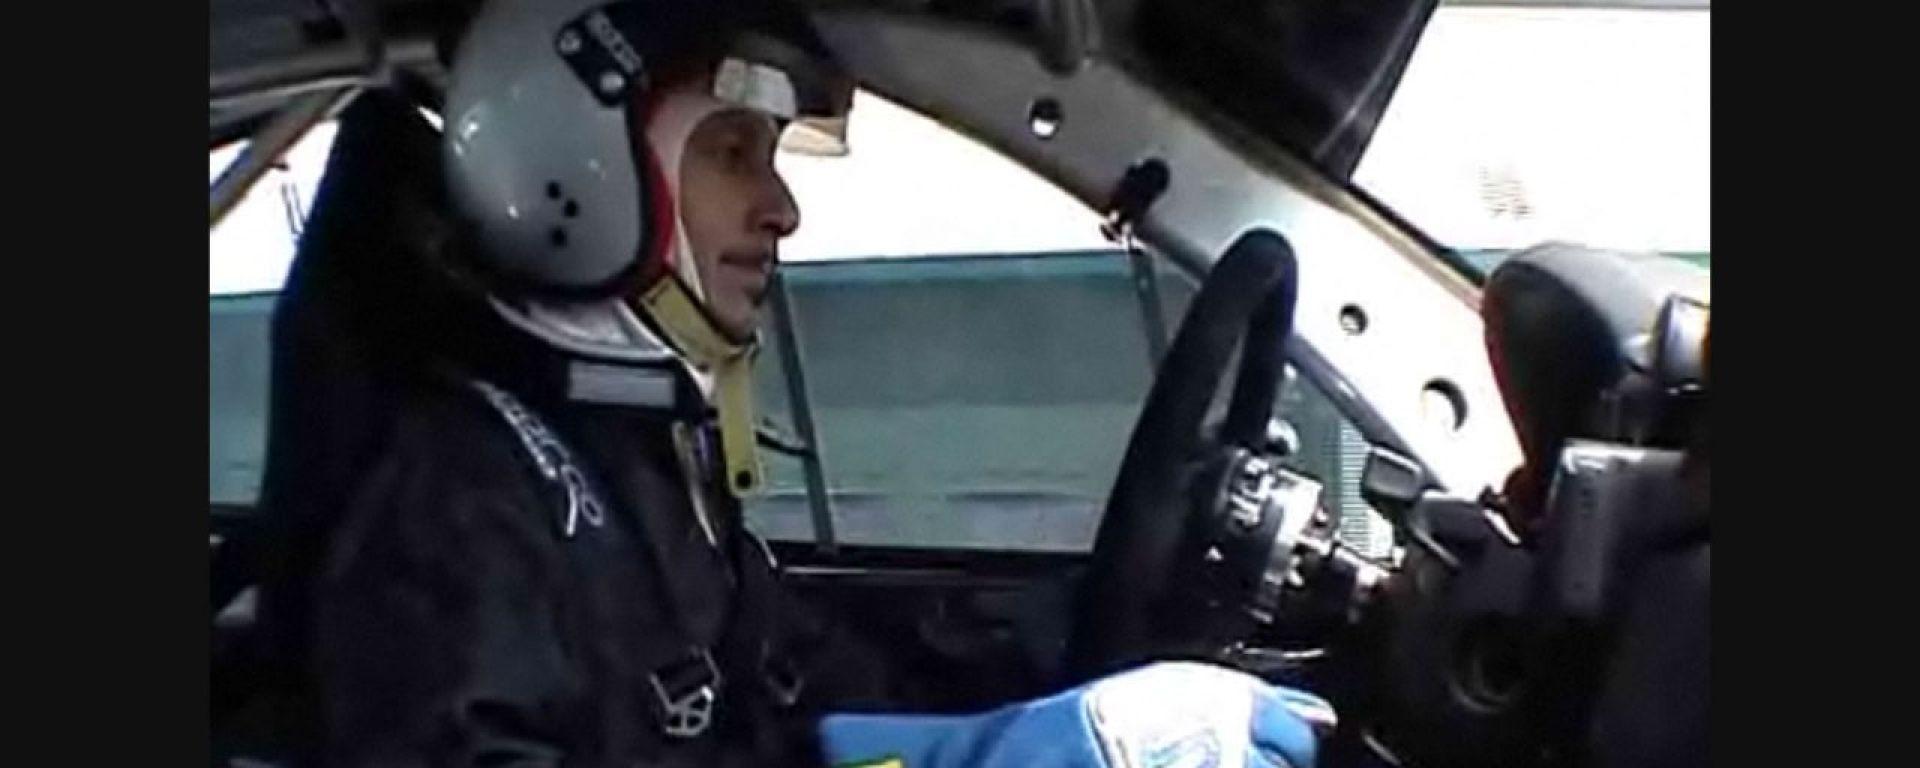 Luca Bizzarri, de Le Iene, in pista a Misano